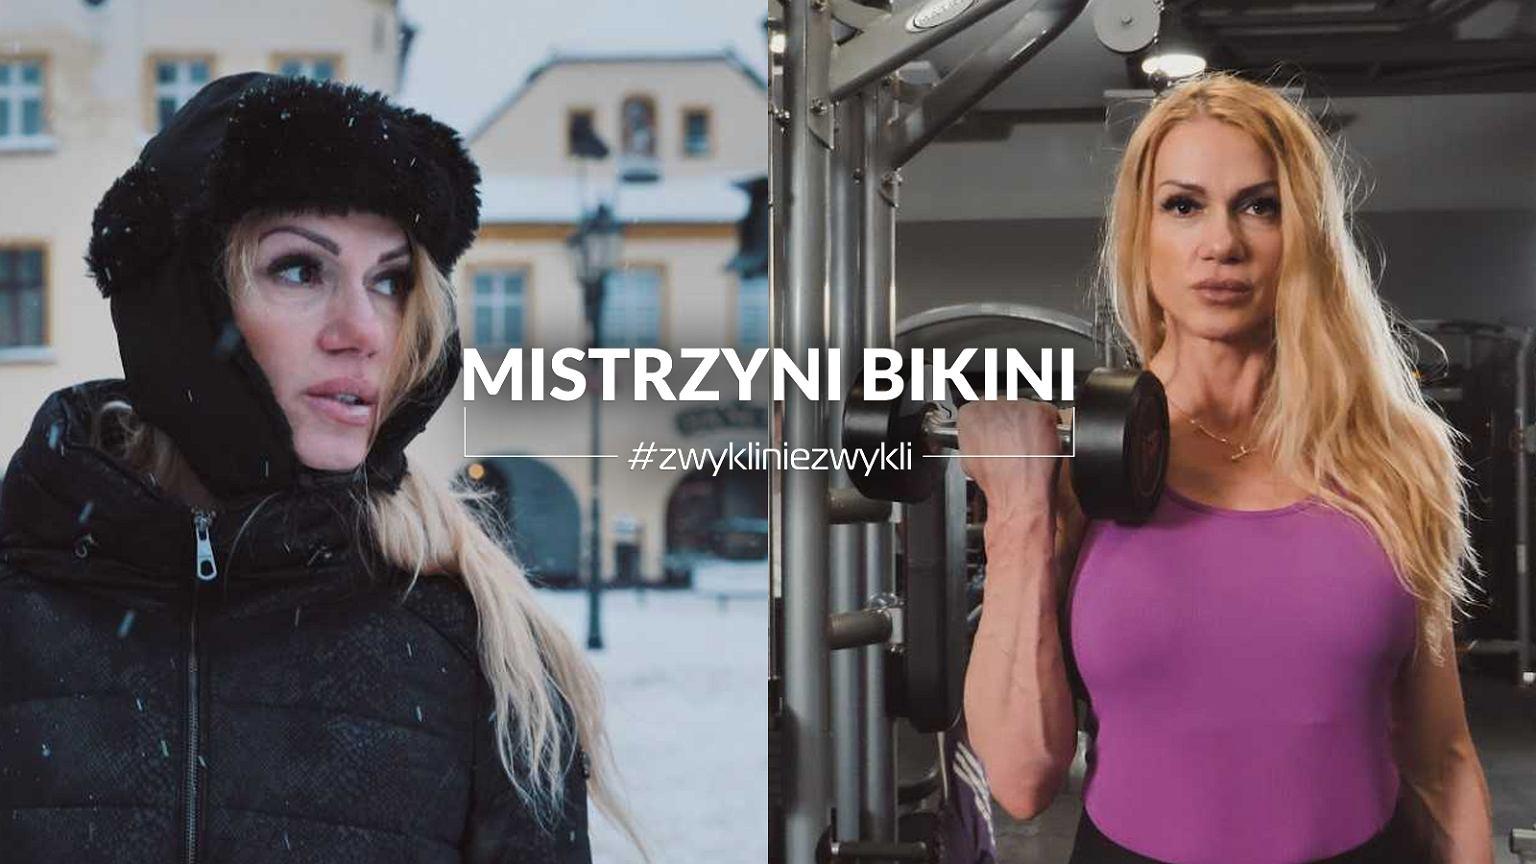 bikini - microdc